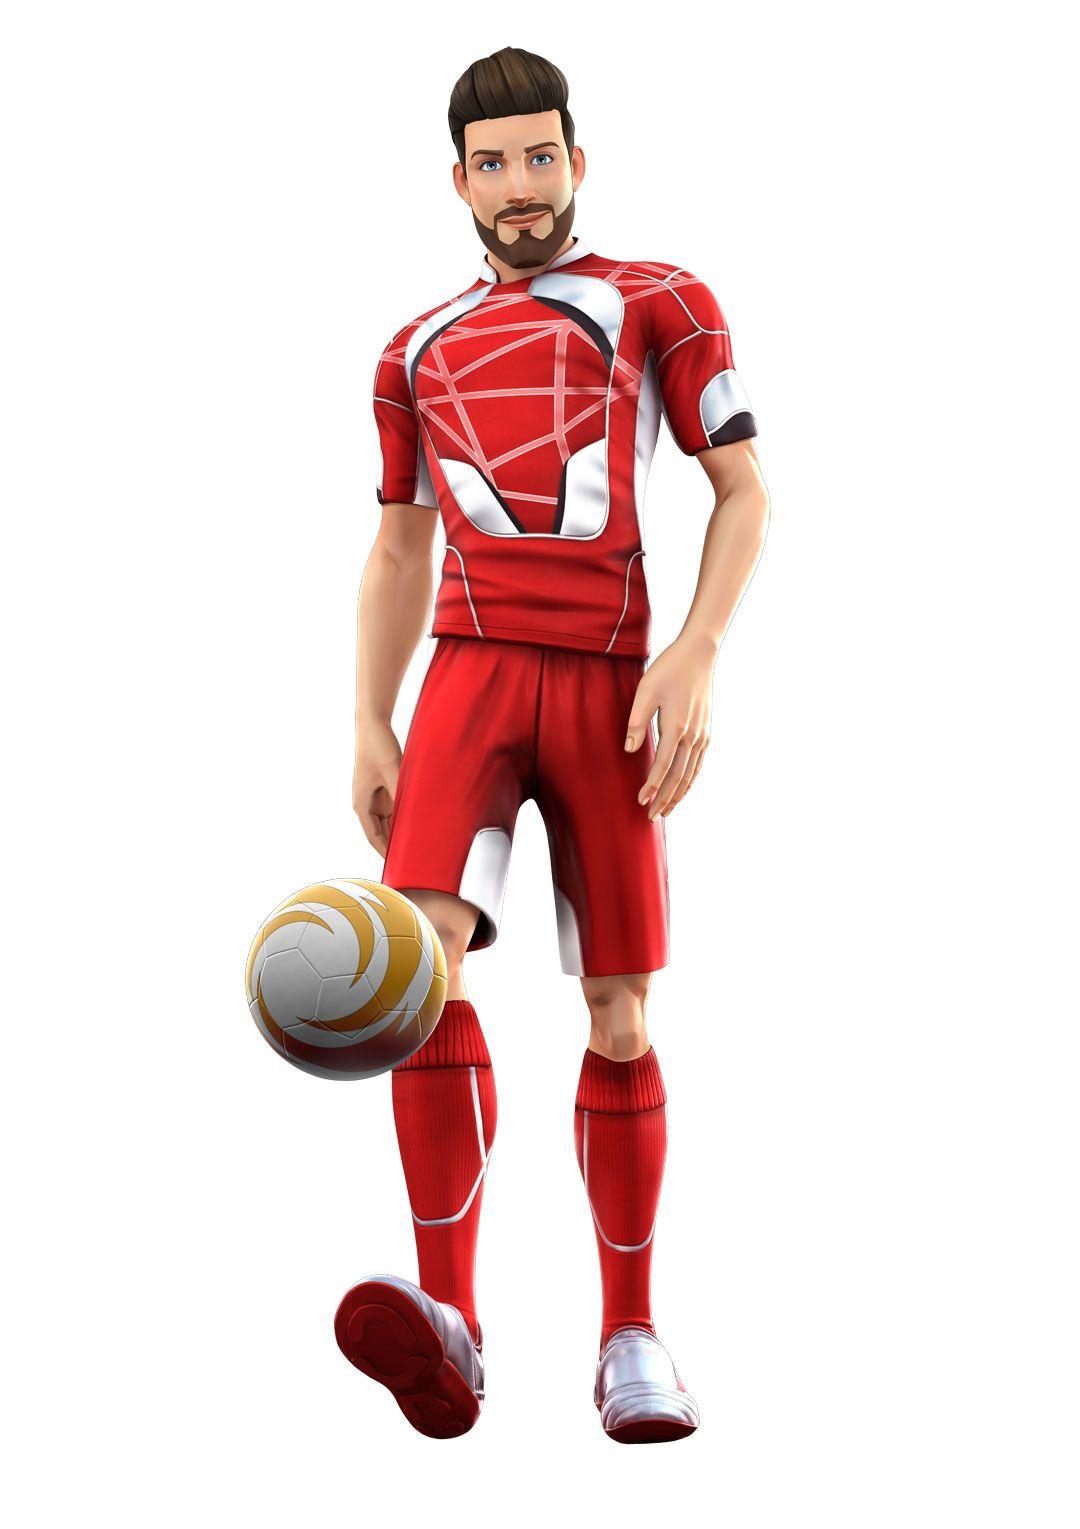 A male KSR Soccer Champion Sports, Xbox one, Champion